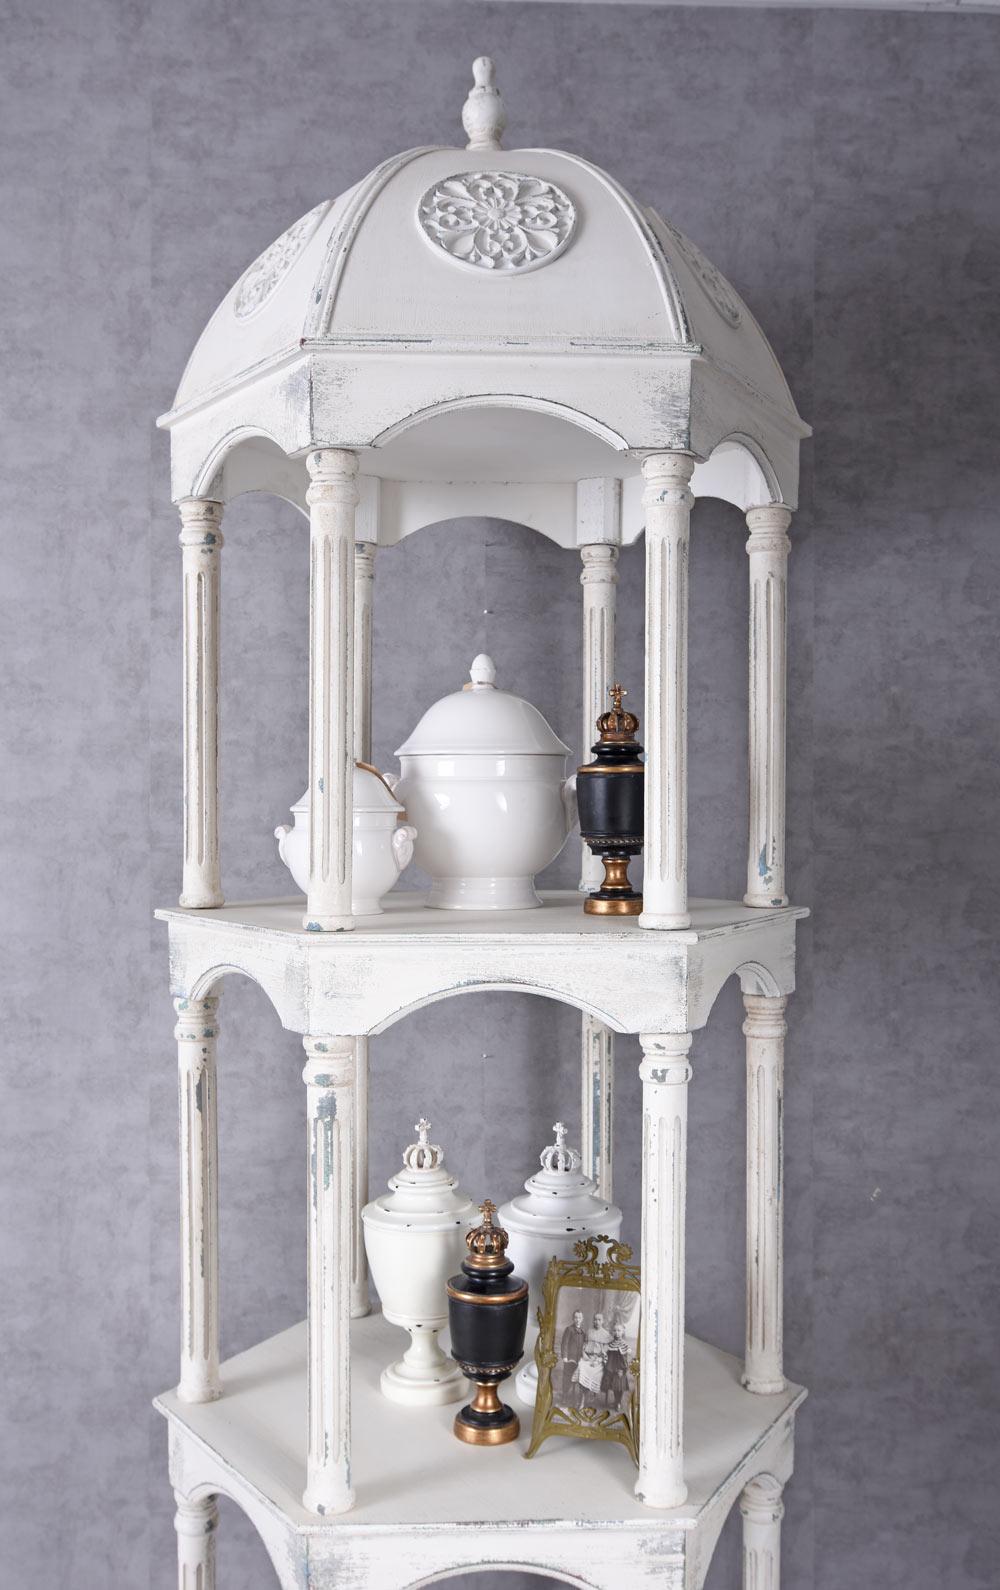 baldachin regal antik b cherregal regalschrank 245cm k chenregal raumteiler holz ebay. Black Bedroom Furniture Sets. Home Design Ideas